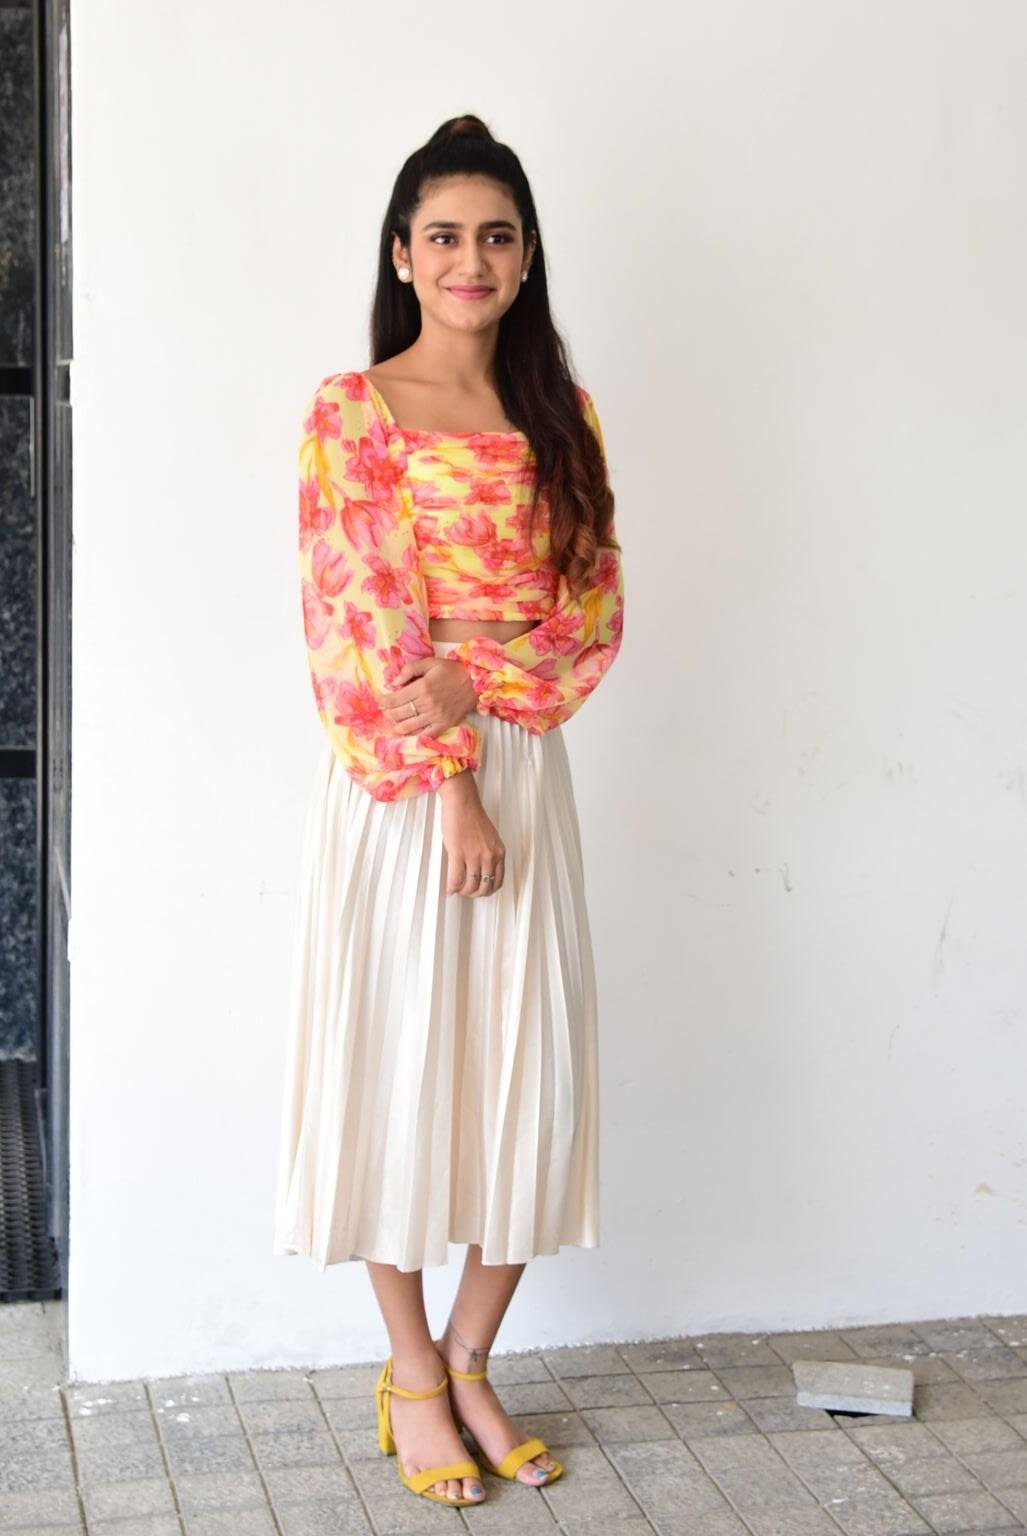 Priya Prakash varrier in skirt and top for Ishq promotions